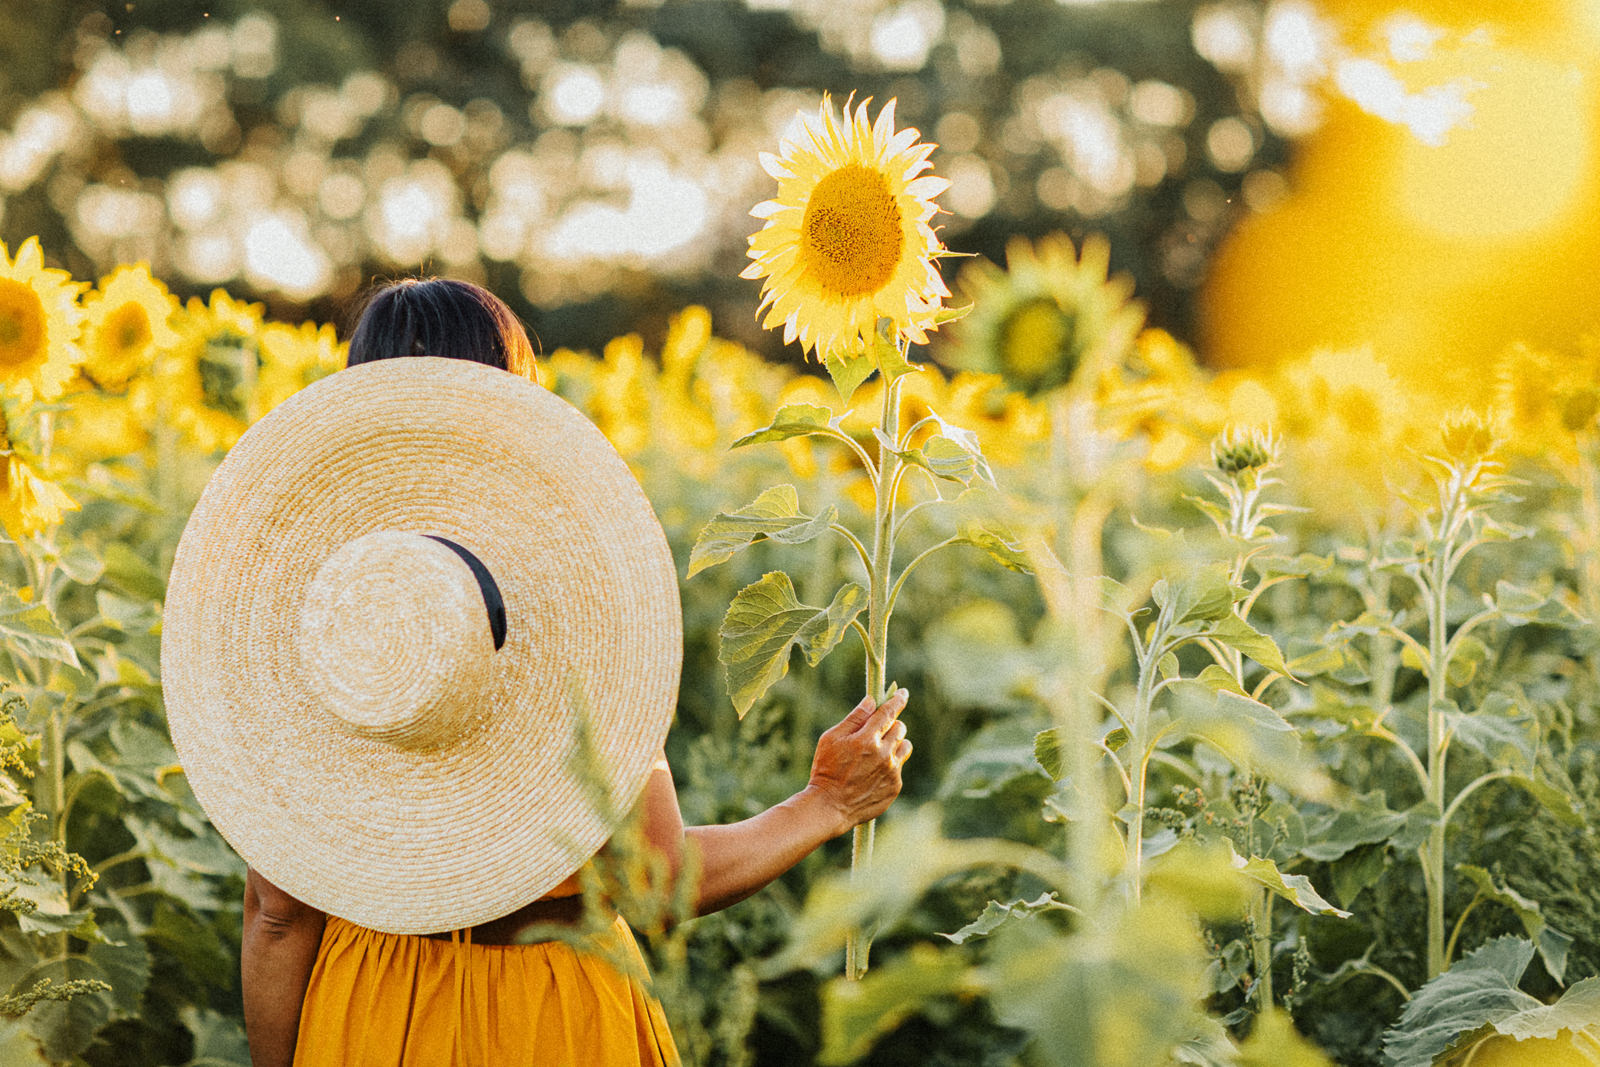 sunflower picking - girl in yellow dress in sunflower field